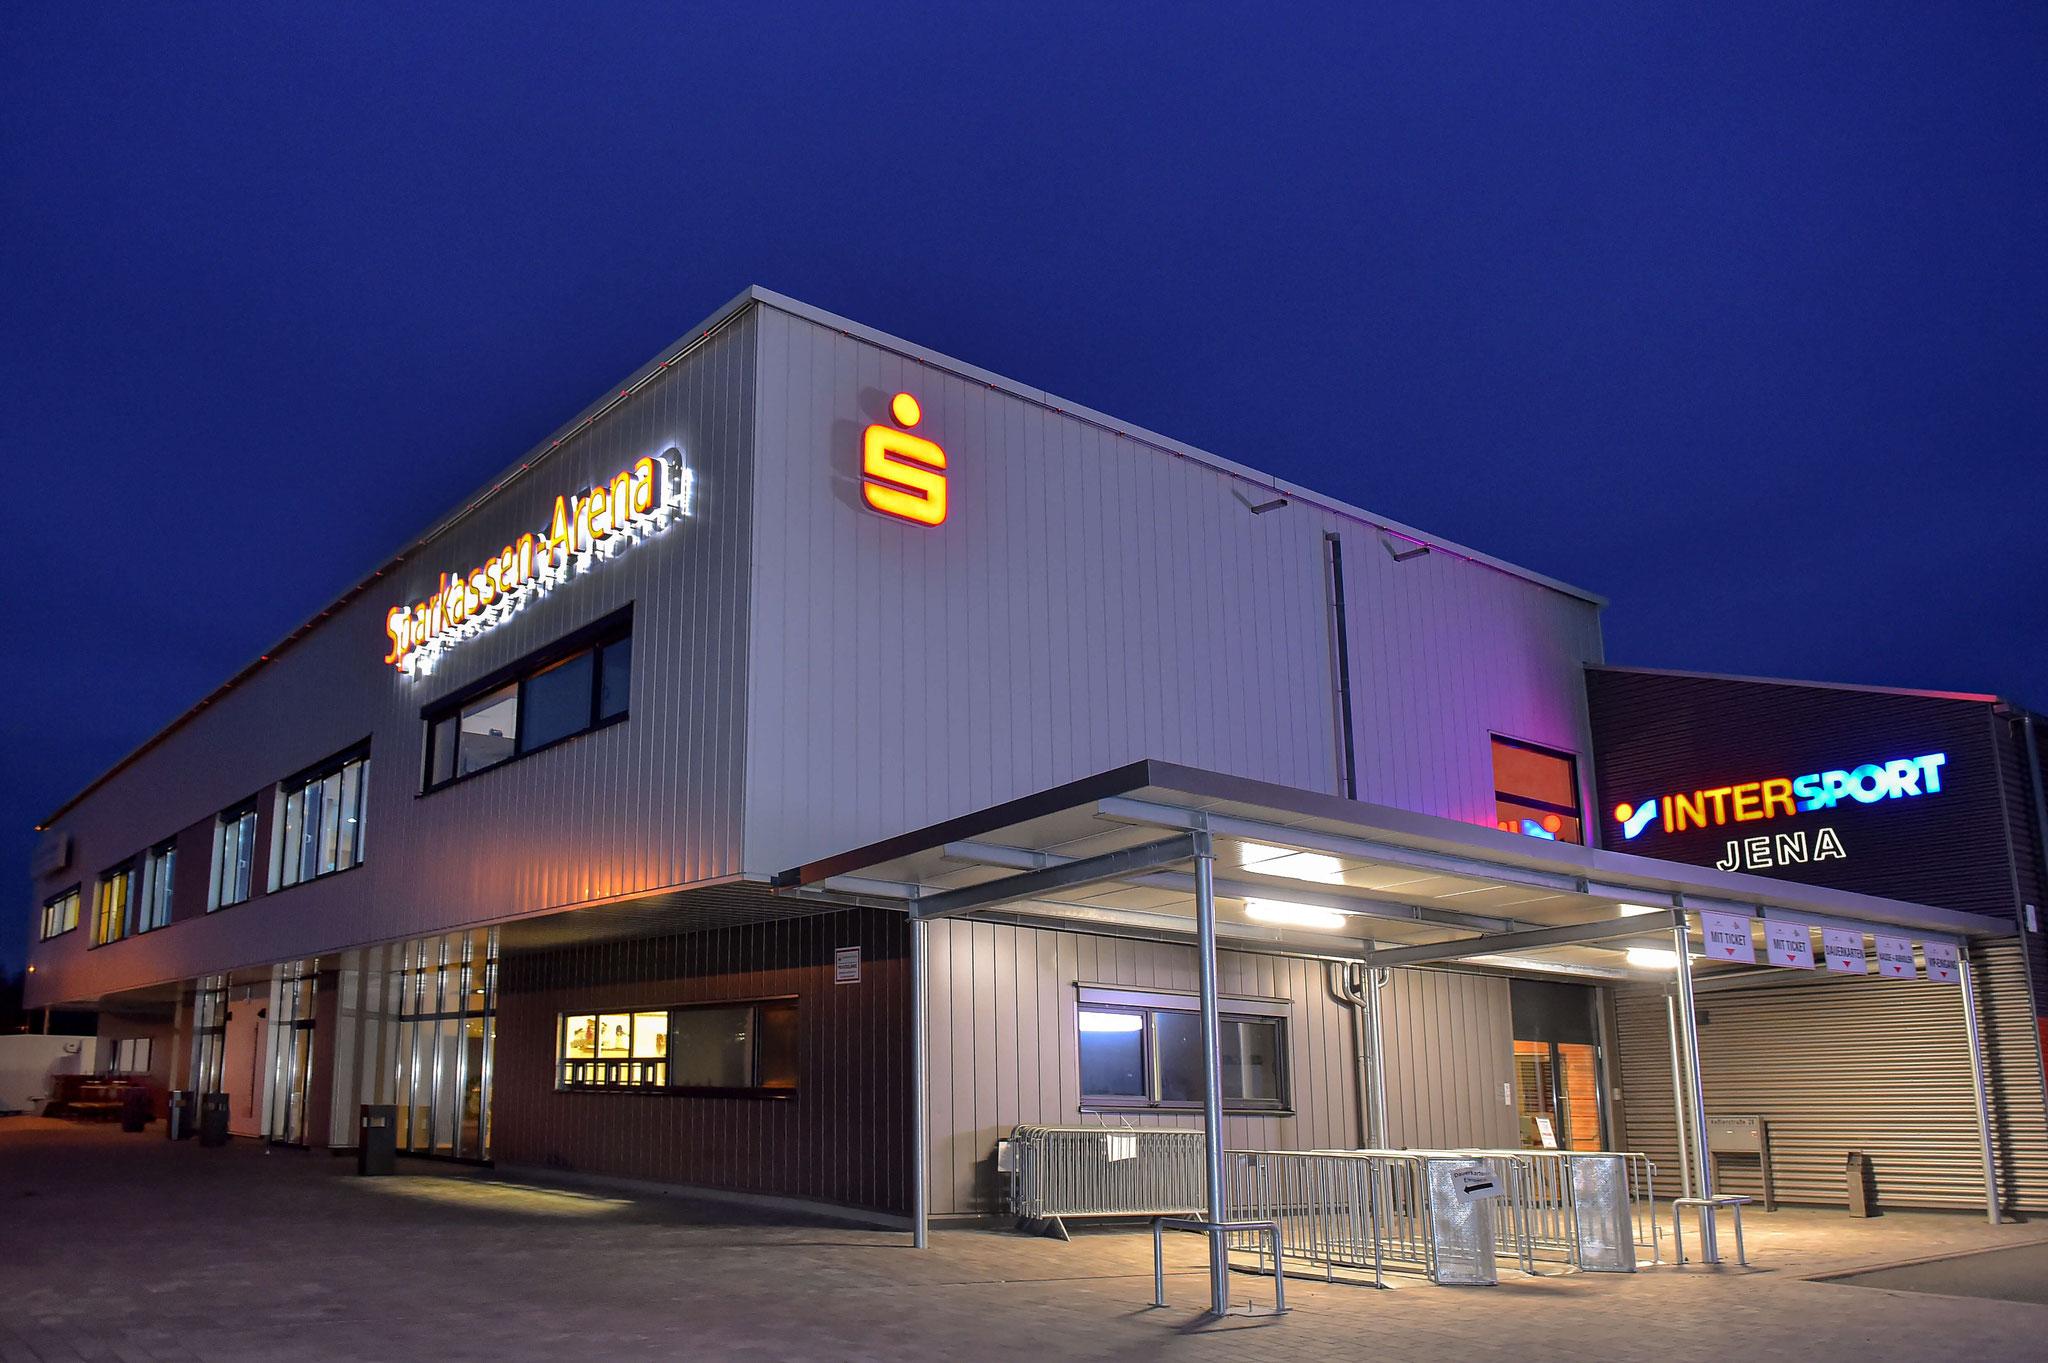 Veranstaltungsort Sparkassenarena Jena